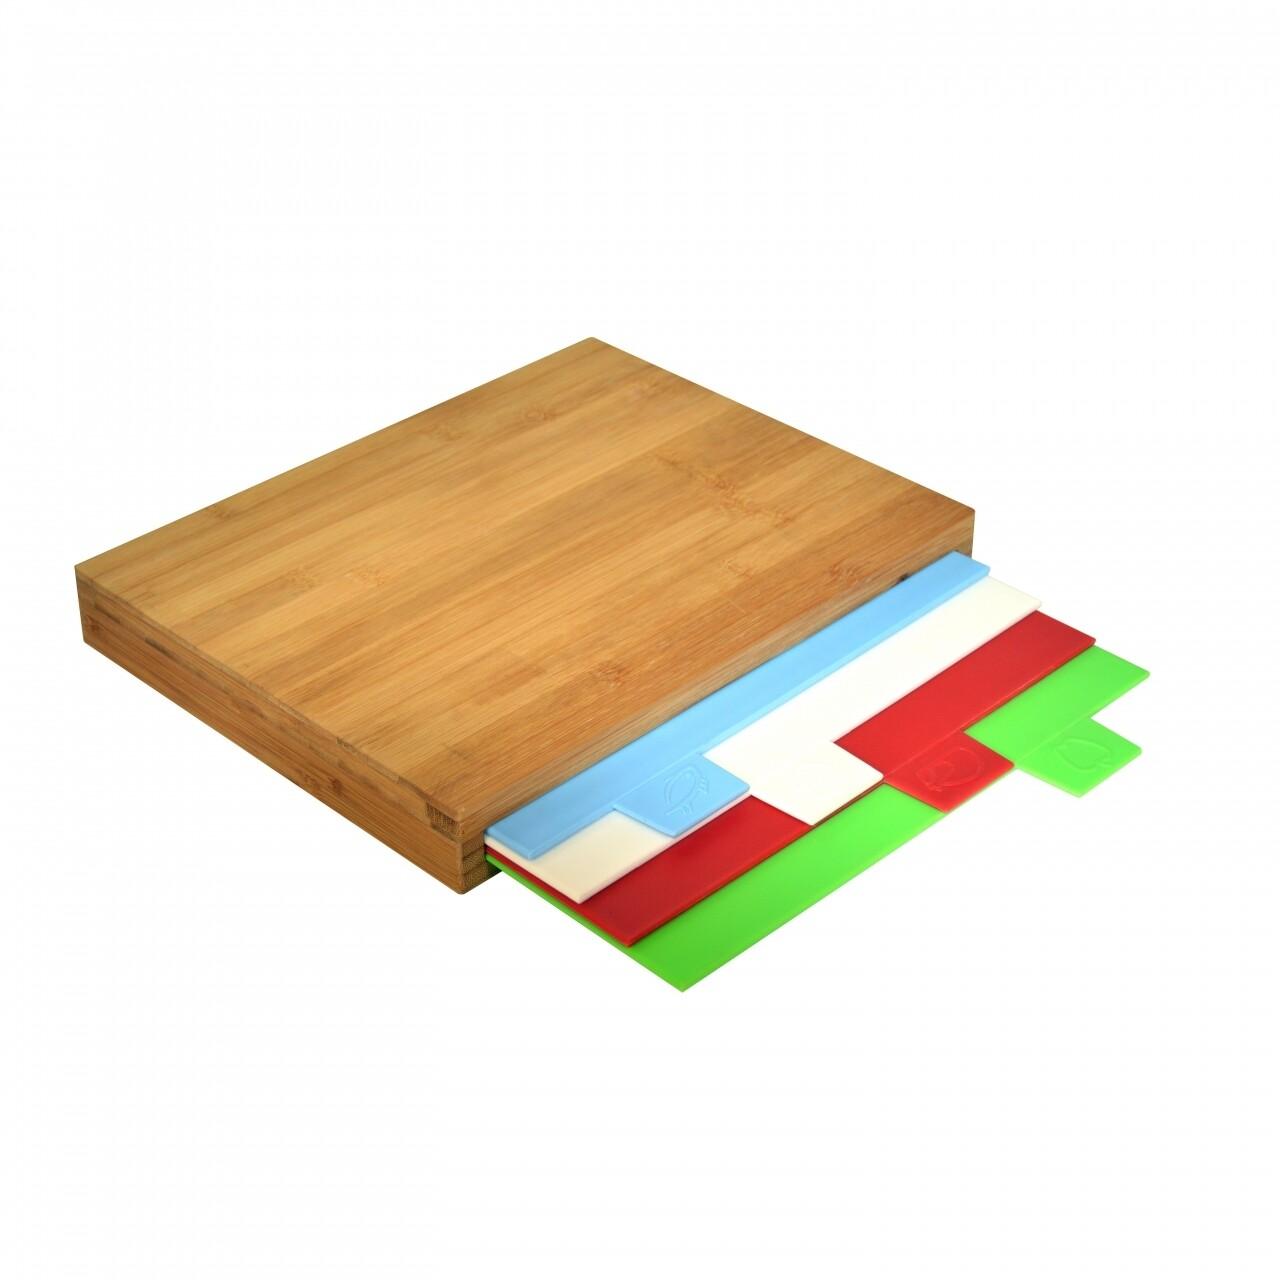 Set 5 tocatoare Colors, Jocca, 25 x 33 x 4 cm, bambus/plastic, multicolor/natur